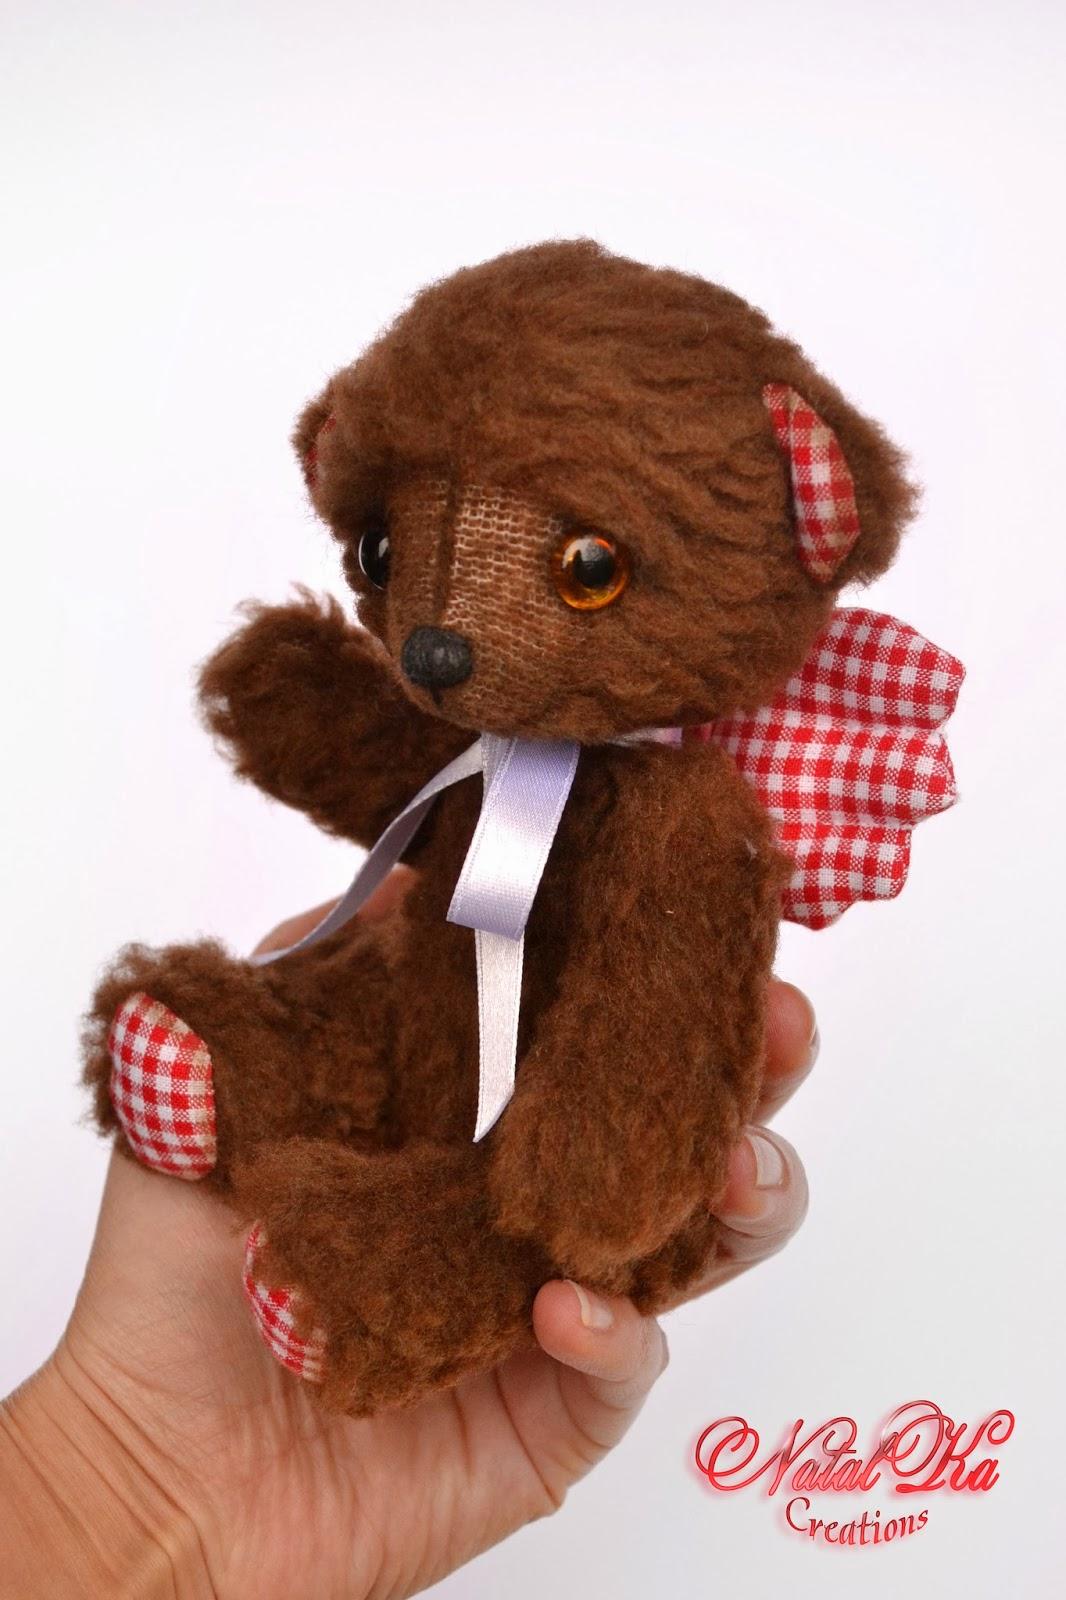 Künstler Teddybär handgemacht von natalKa Creations. Artist teddy bear handmade by NatalKa Creations